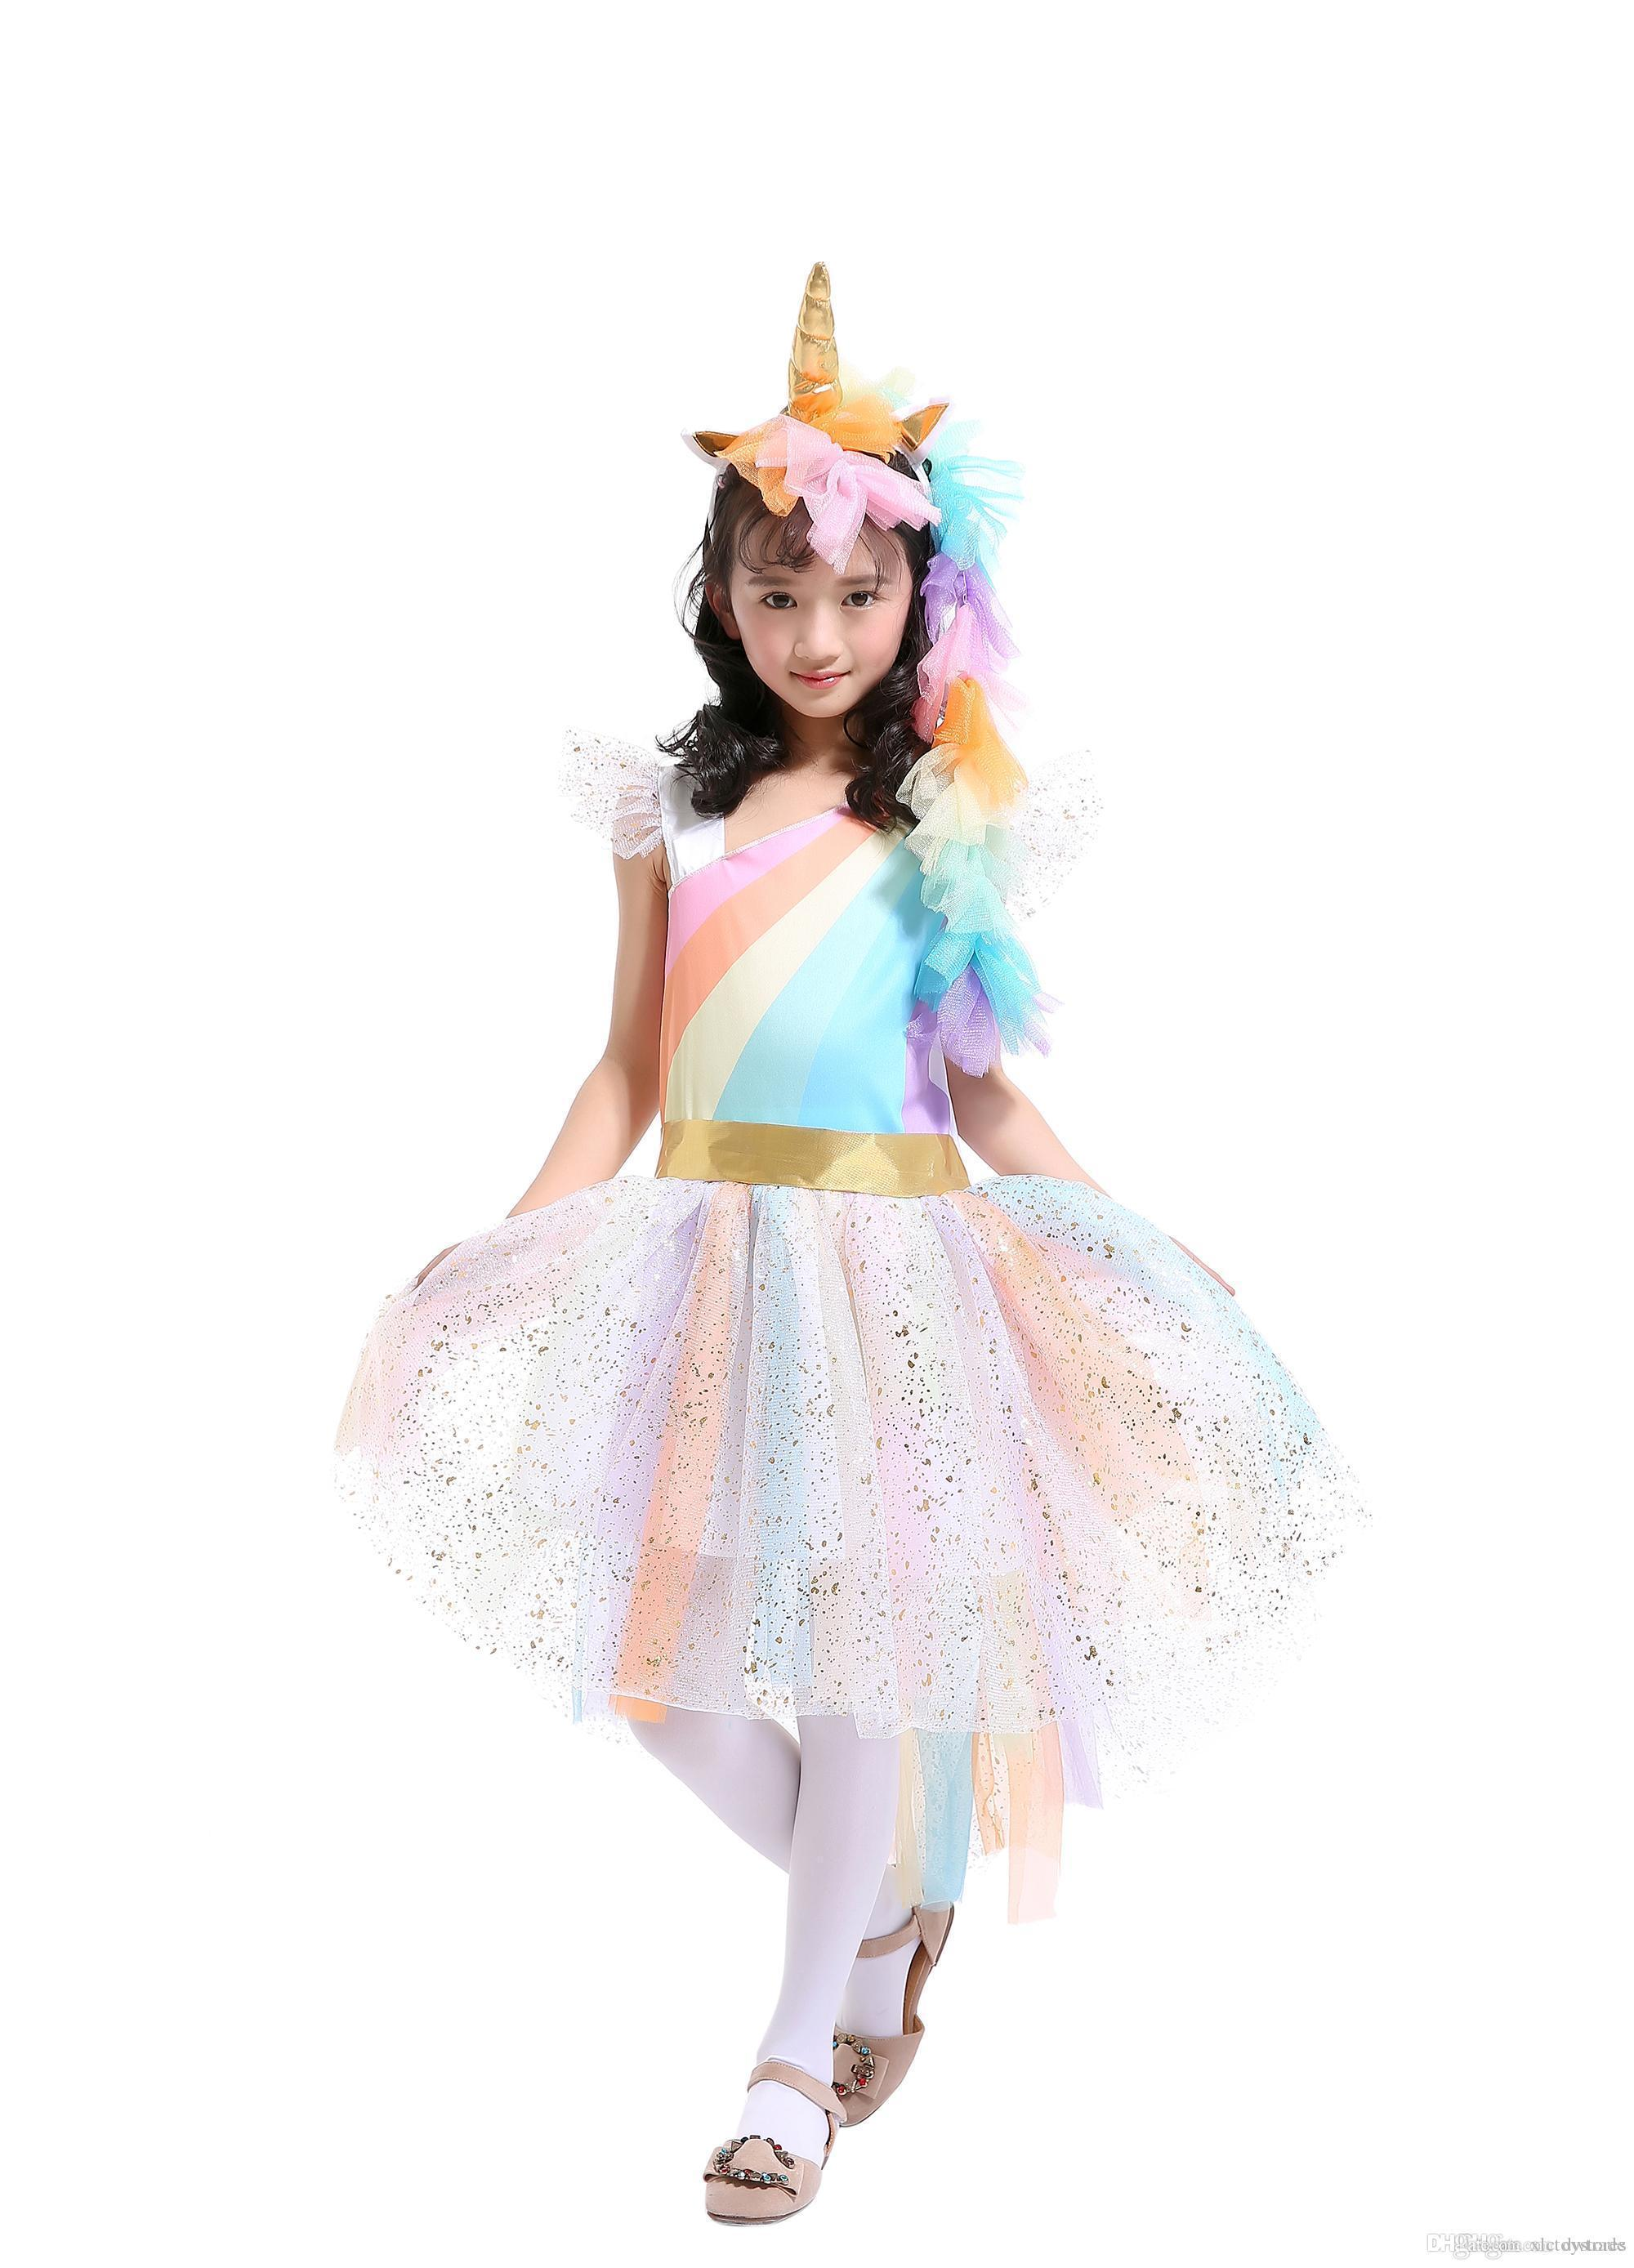 Unicorn Princess Tutu Dress Suits with 1 Unicorn Corn Headband+1 Golden Wings Cosplay Clothing Girls Stage Performance Dresses